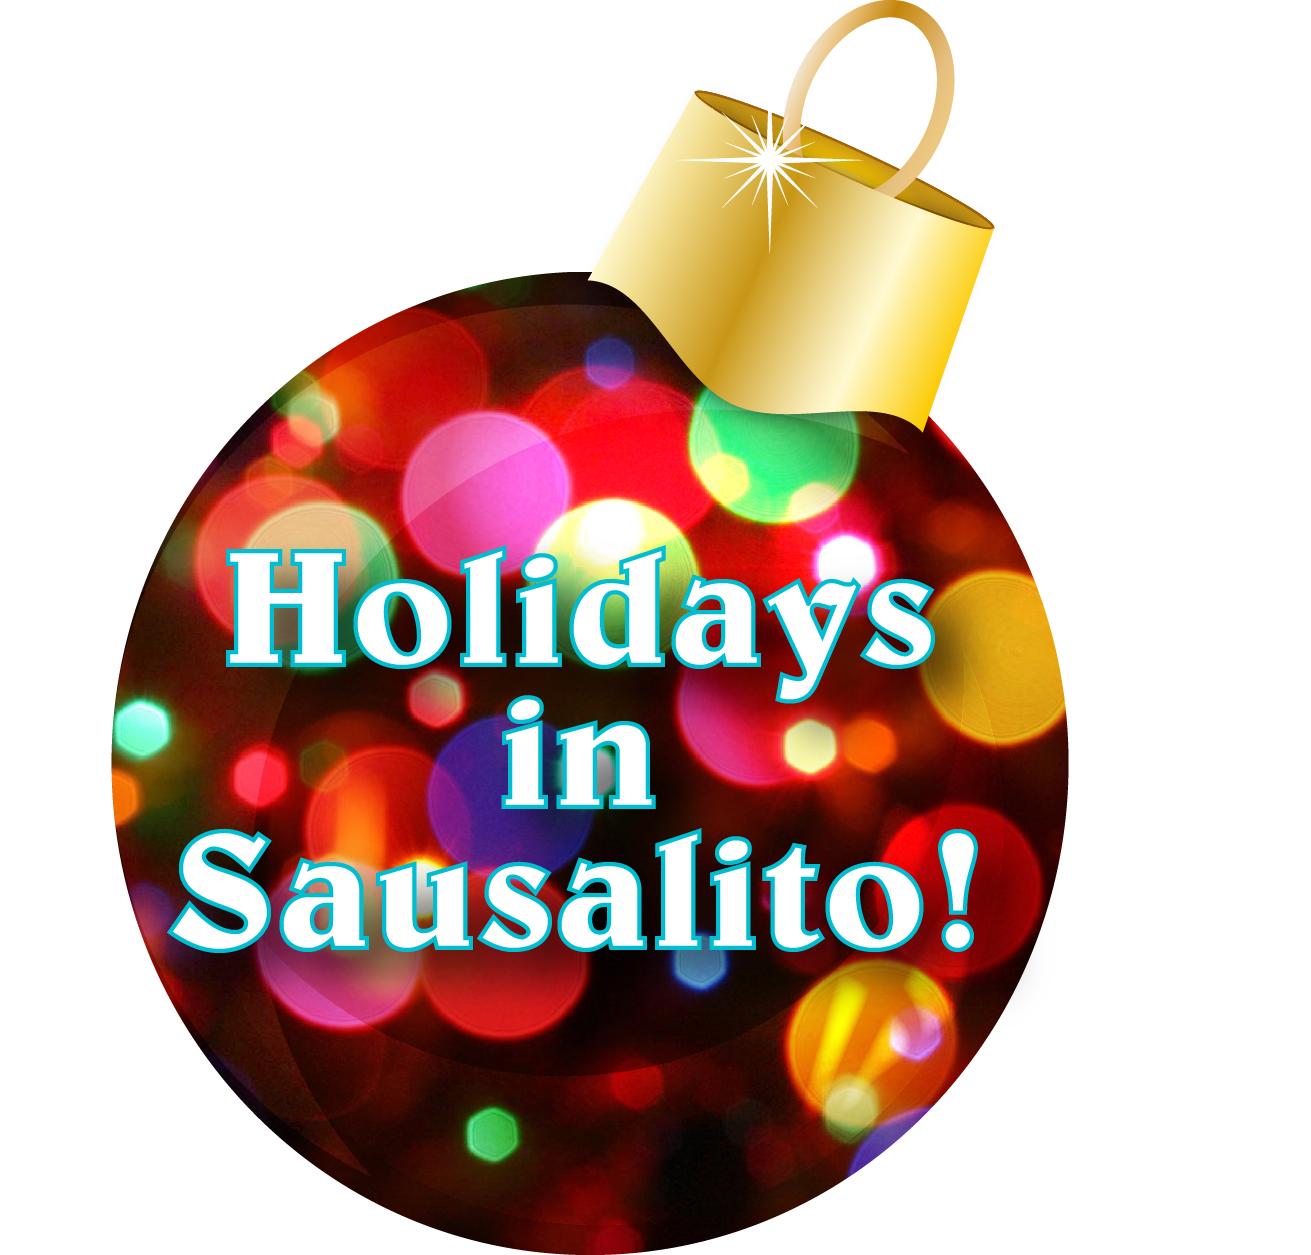 Holidays in Sausalito